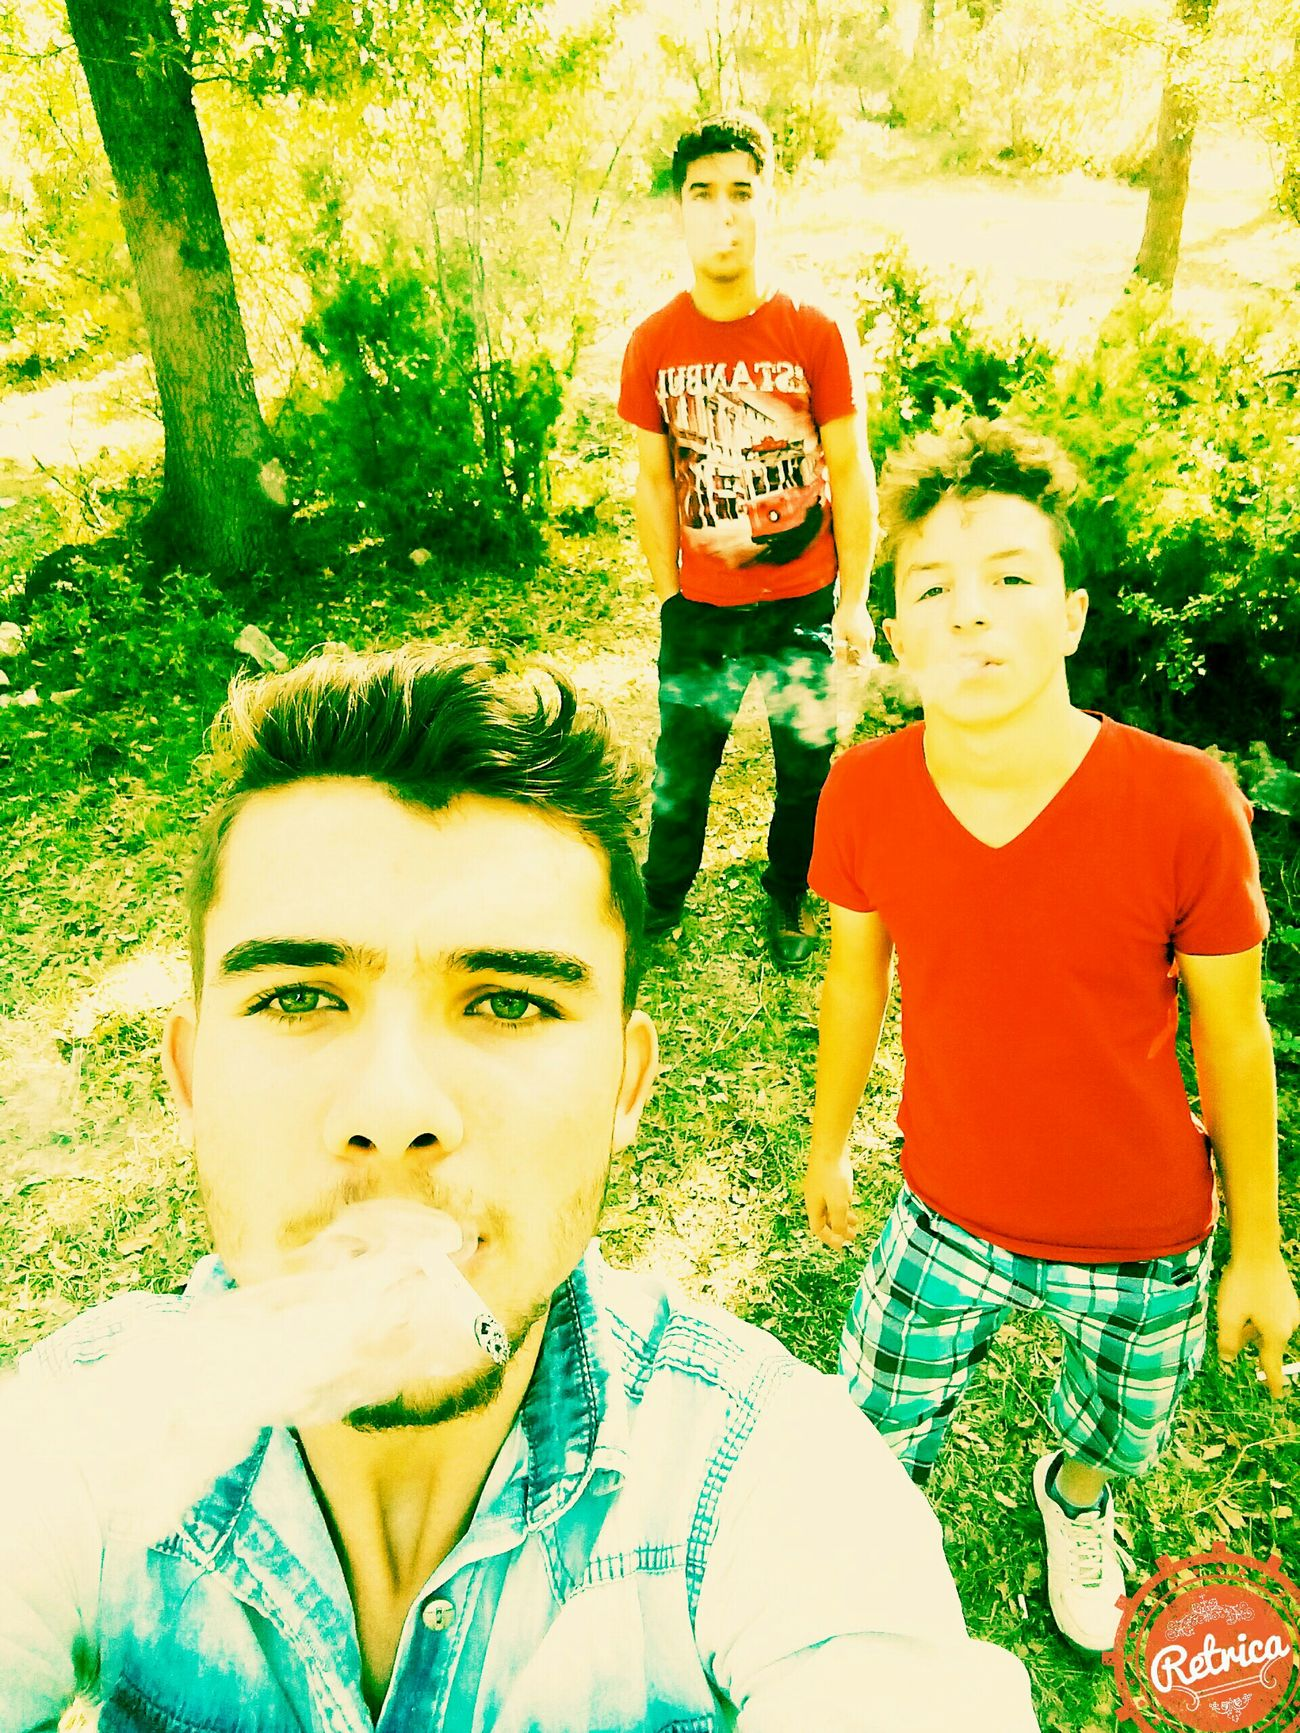 Sigara keyfi Ali Fuat Güler , Ferdi Pınar ile First Eyeem Photo